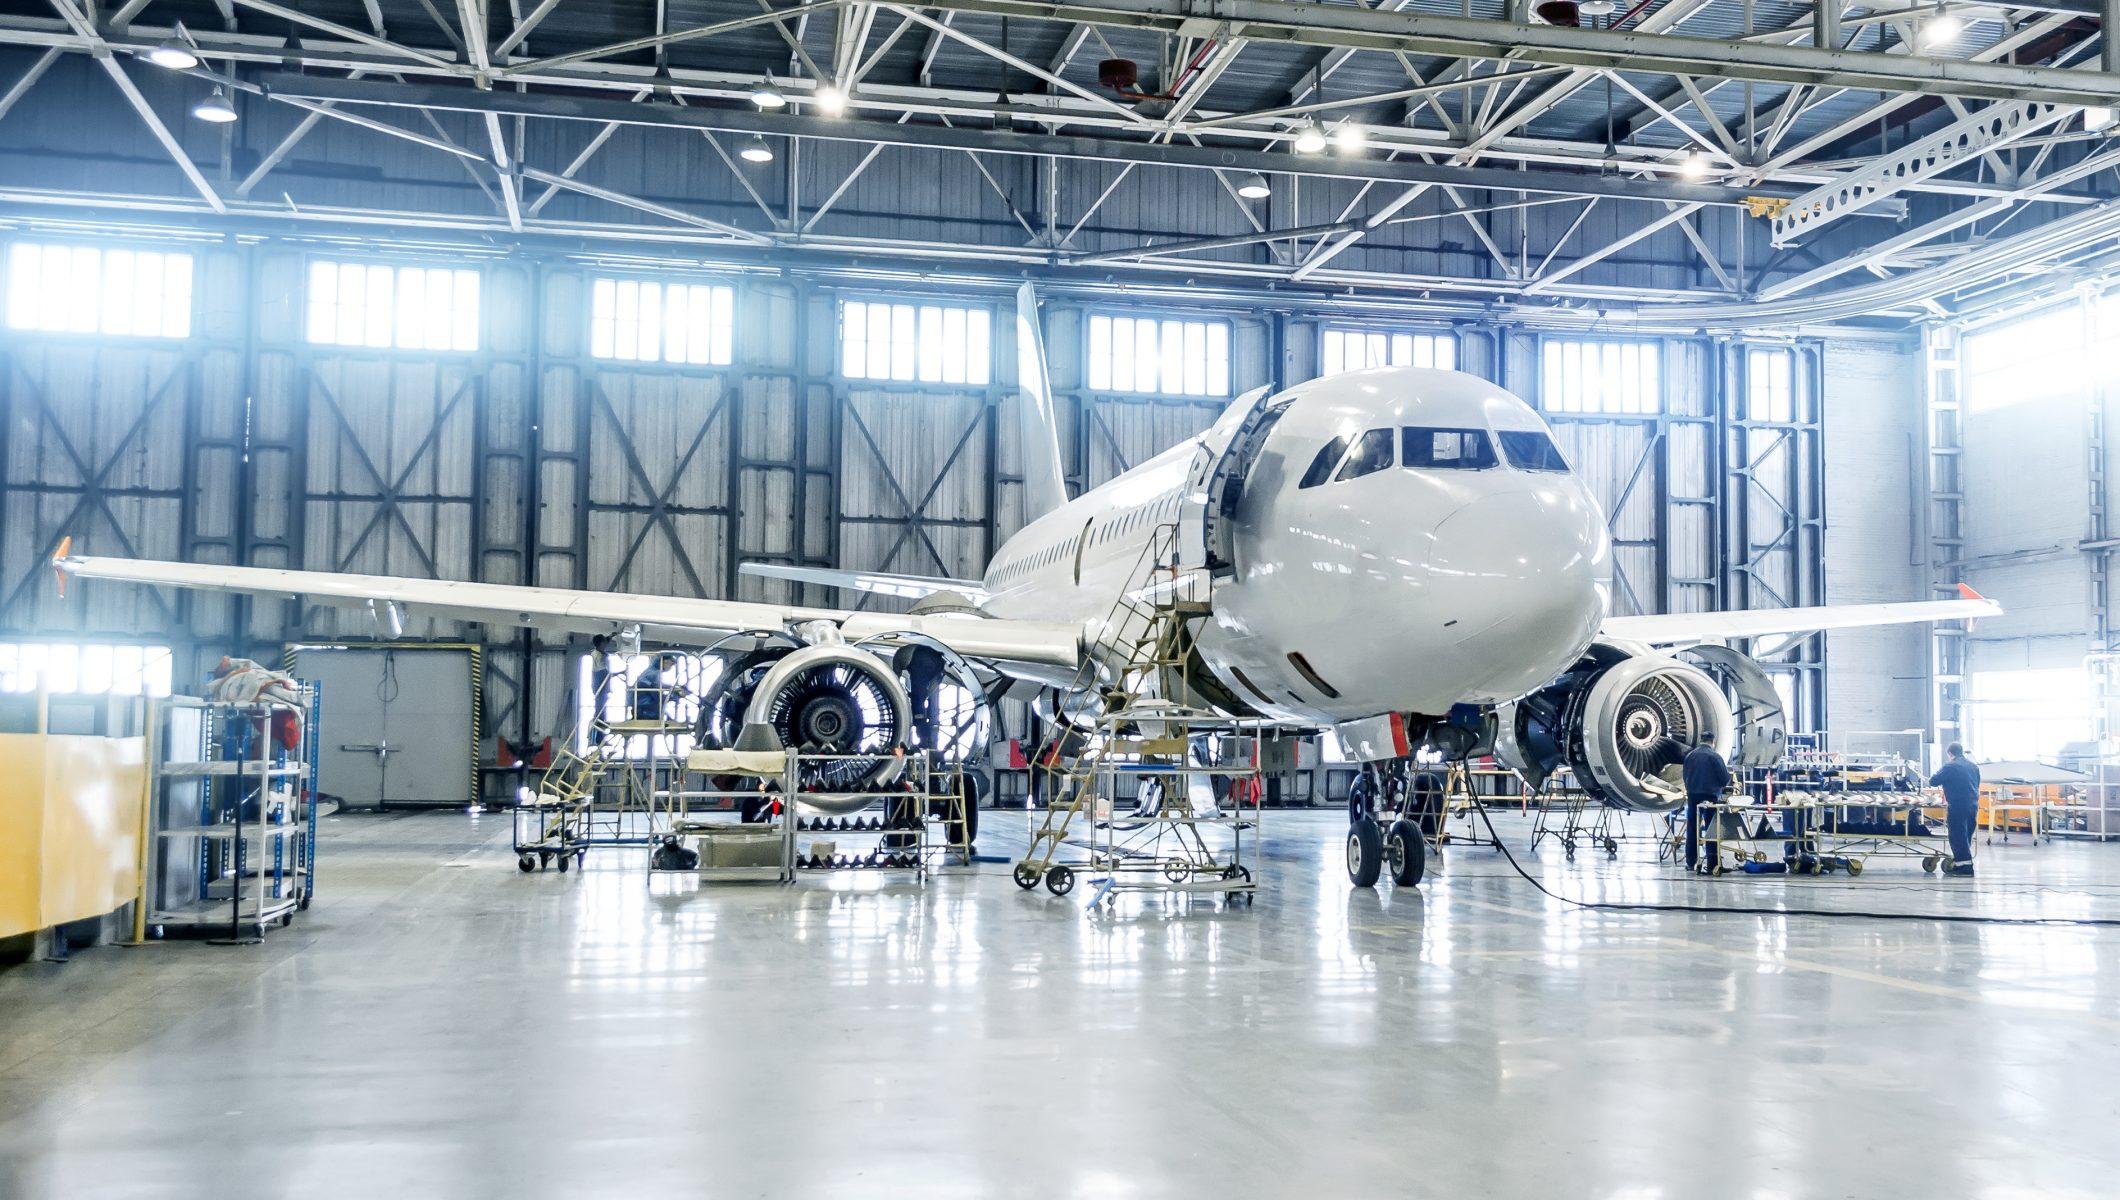 Passenger airplane on maintenance of engine and fuselage check repair in airport hangar